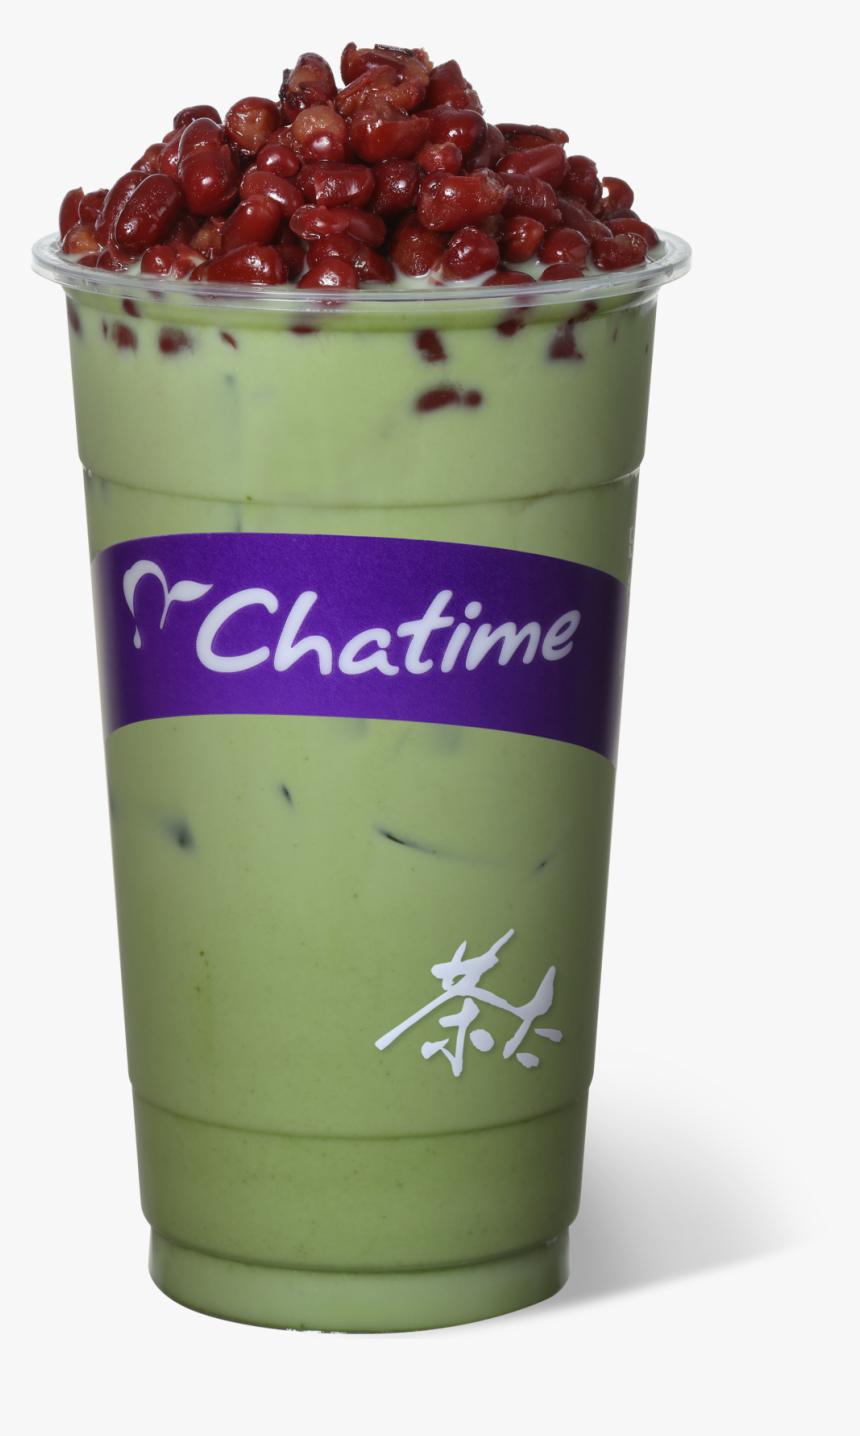 Tªvª E Umatcha Red Bean Milk Tea Chatime Qq Hd Png Download Transparent Png Image Pngitem